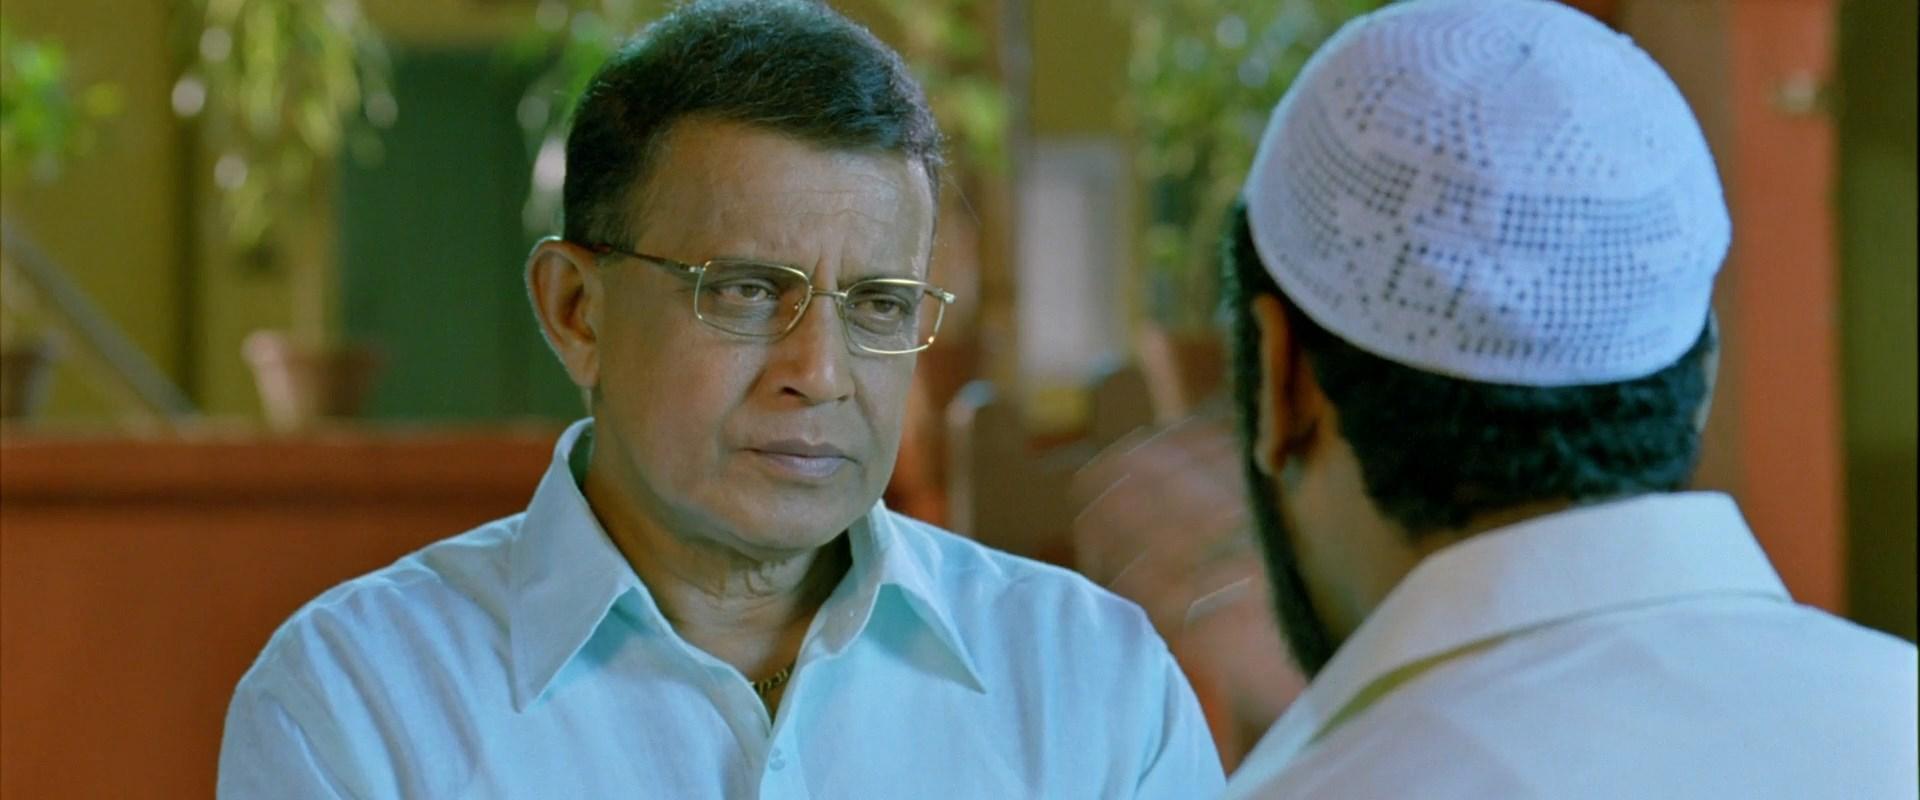 Ami Shubhash Bolchi.2020.Bangali.1080p.WEB DL.H264.AAC.D0T.Telly.mkv snapshot 01.53.54.000